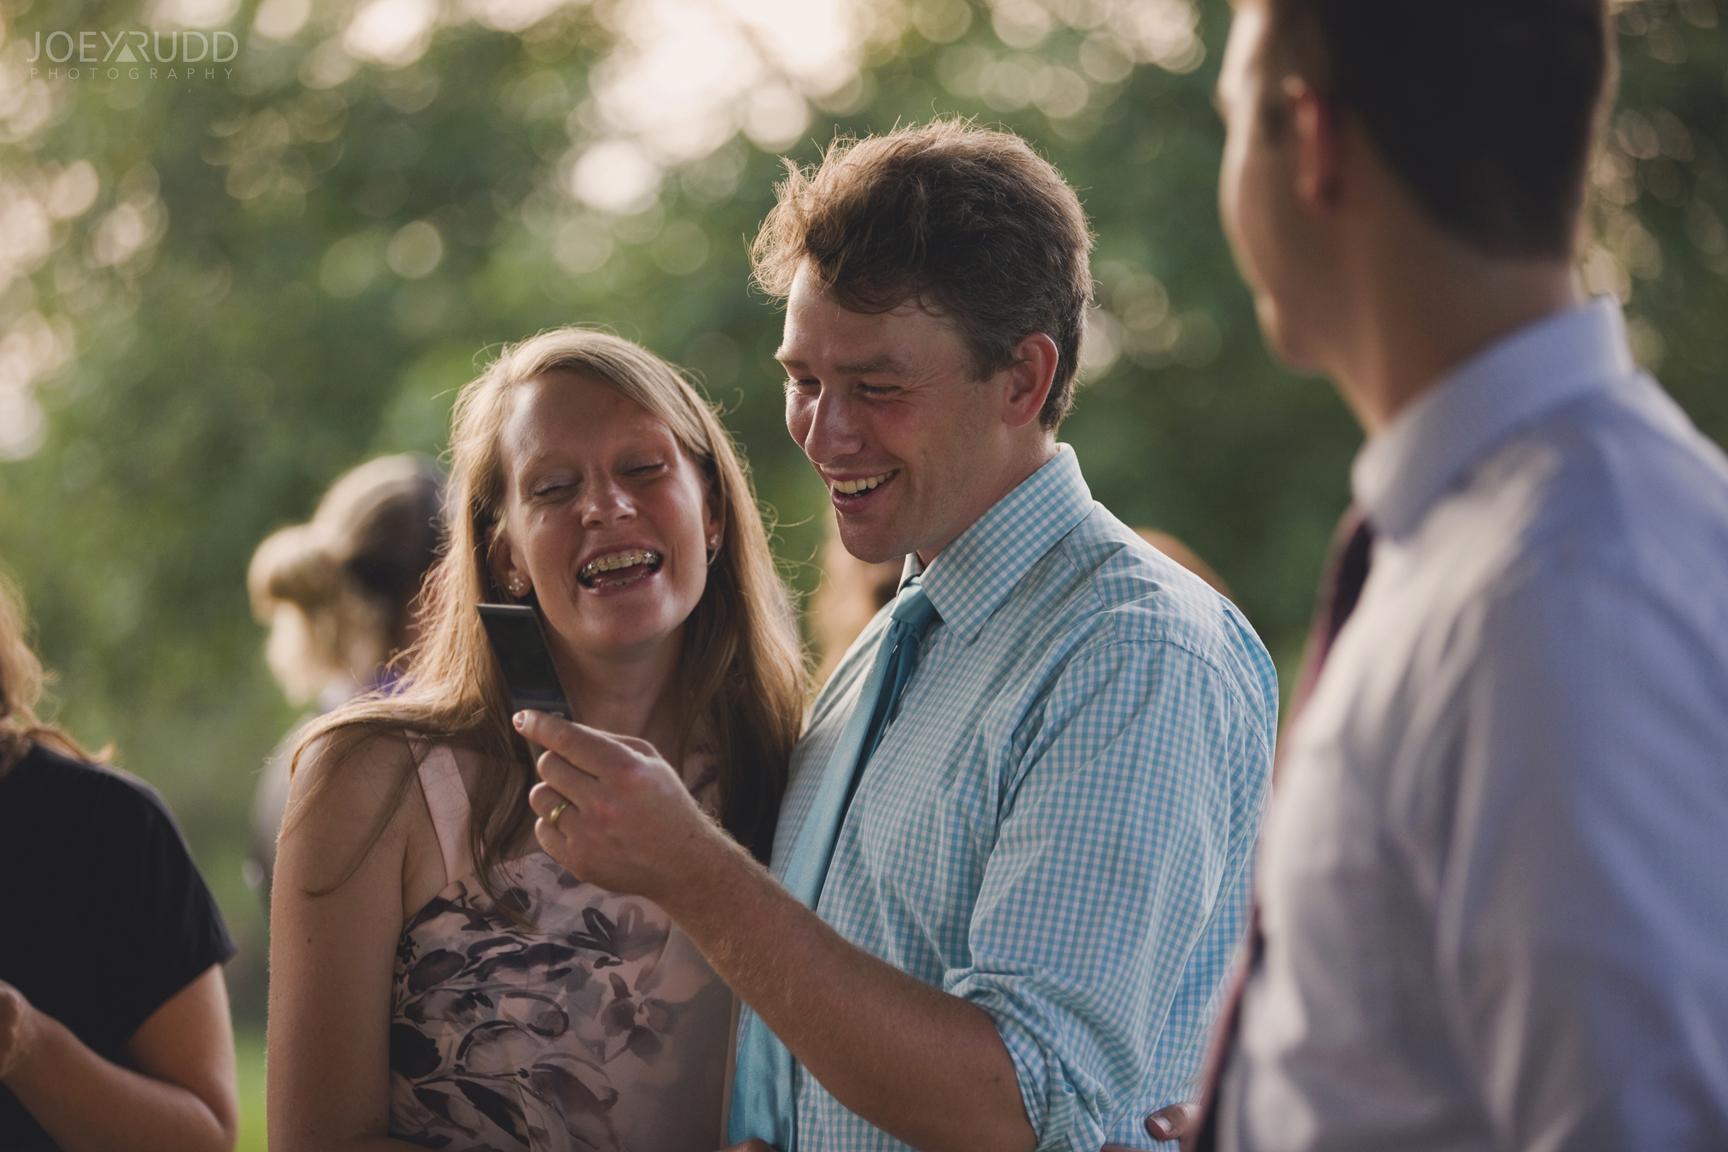 Backyard Kingston Wedding by Ottawa Wedding Photographer Joey Rudd Photography Candid Polaroid